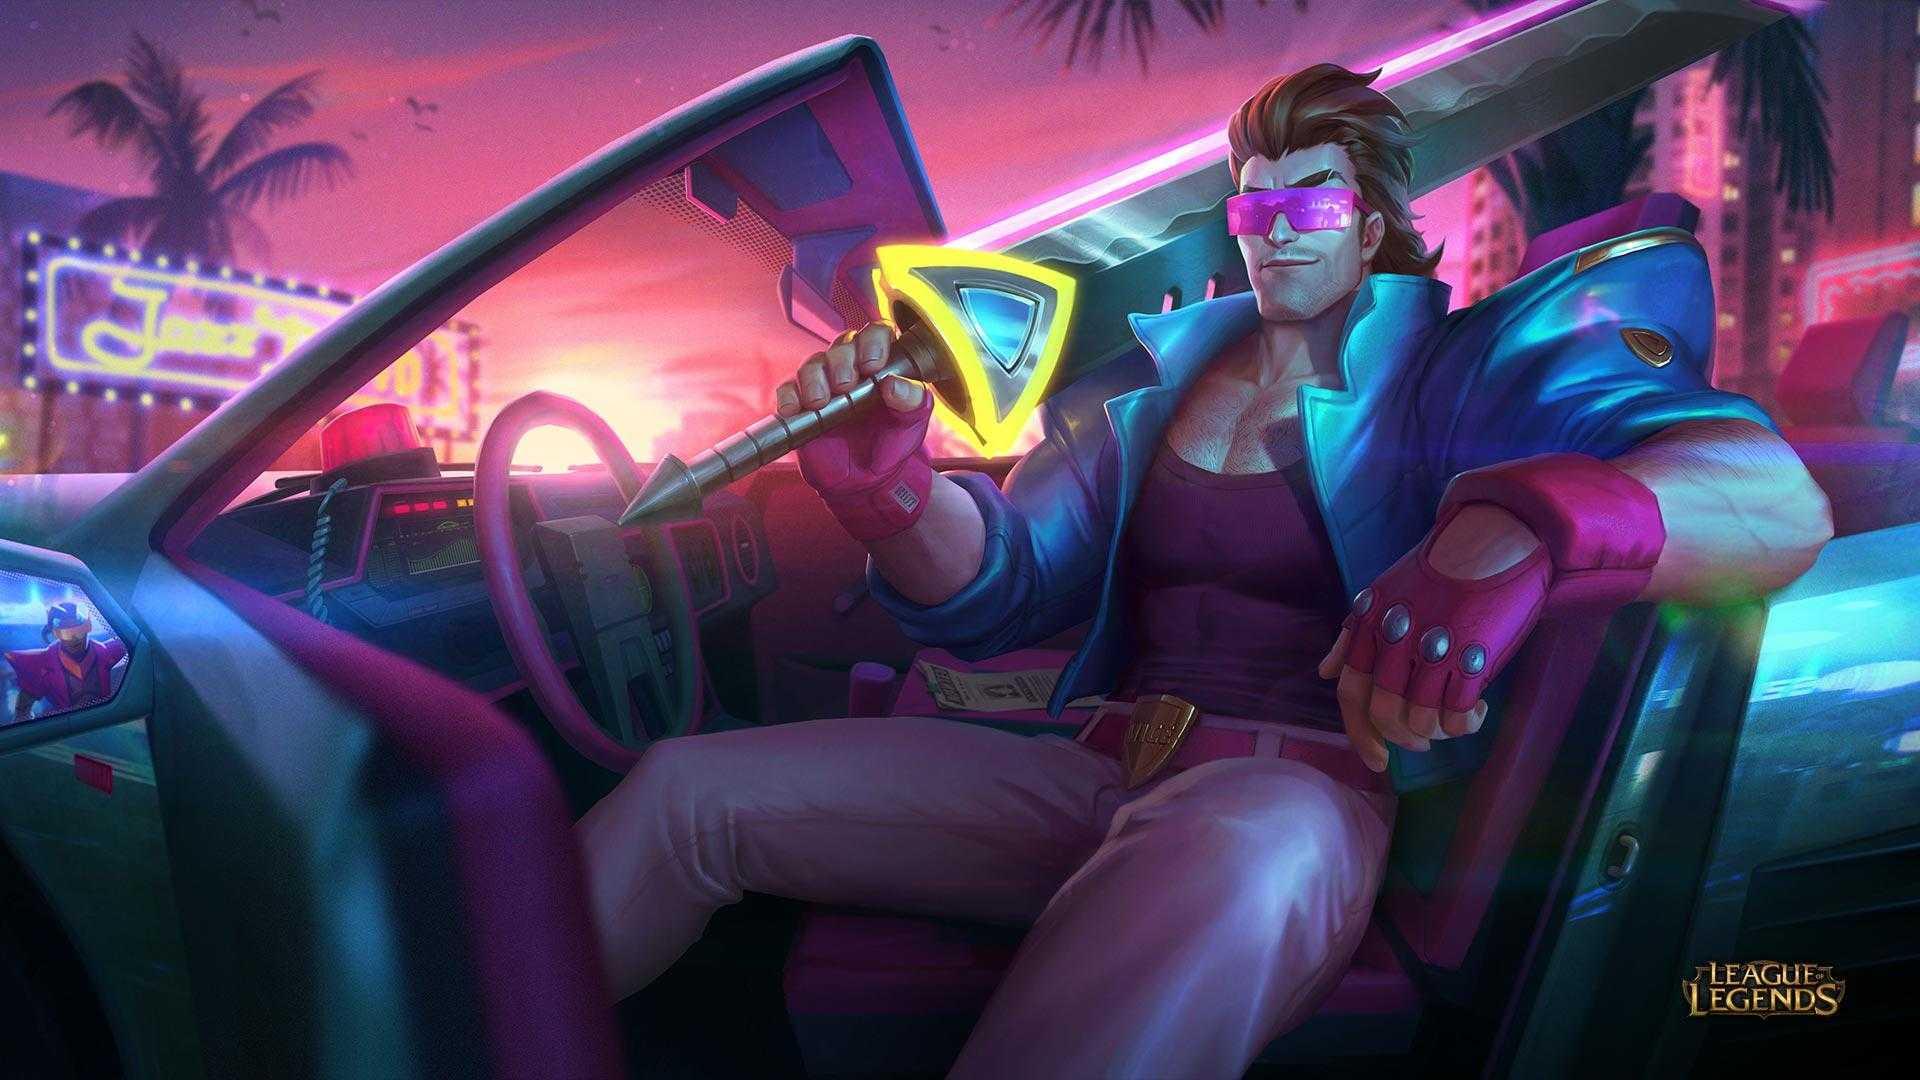 game reviews, League of legends, rework teemo, teemo changes, teemo rework